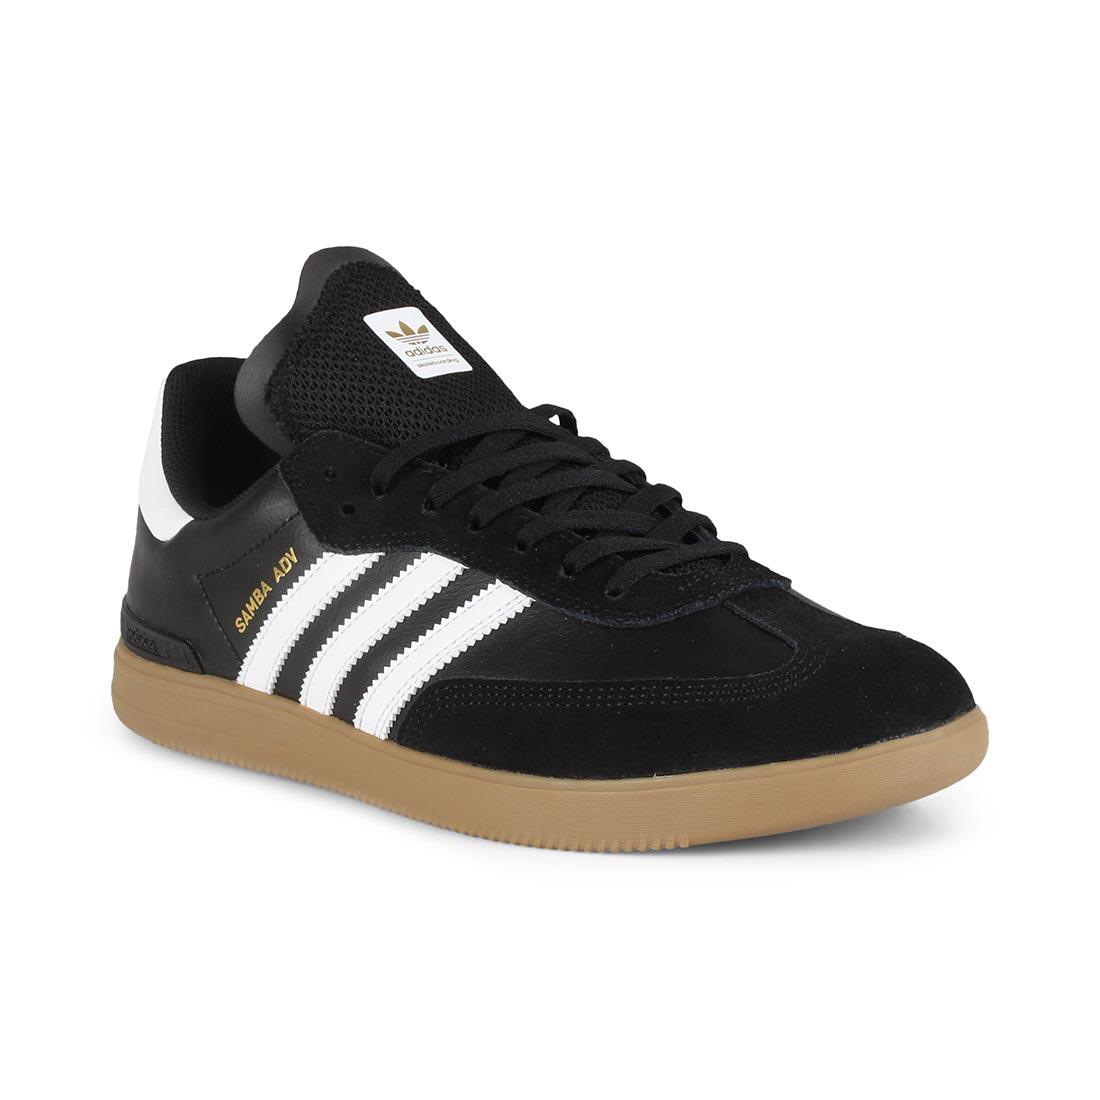 2eff100e7 Adidas Samba ADV Shoes – Black / White / Gum